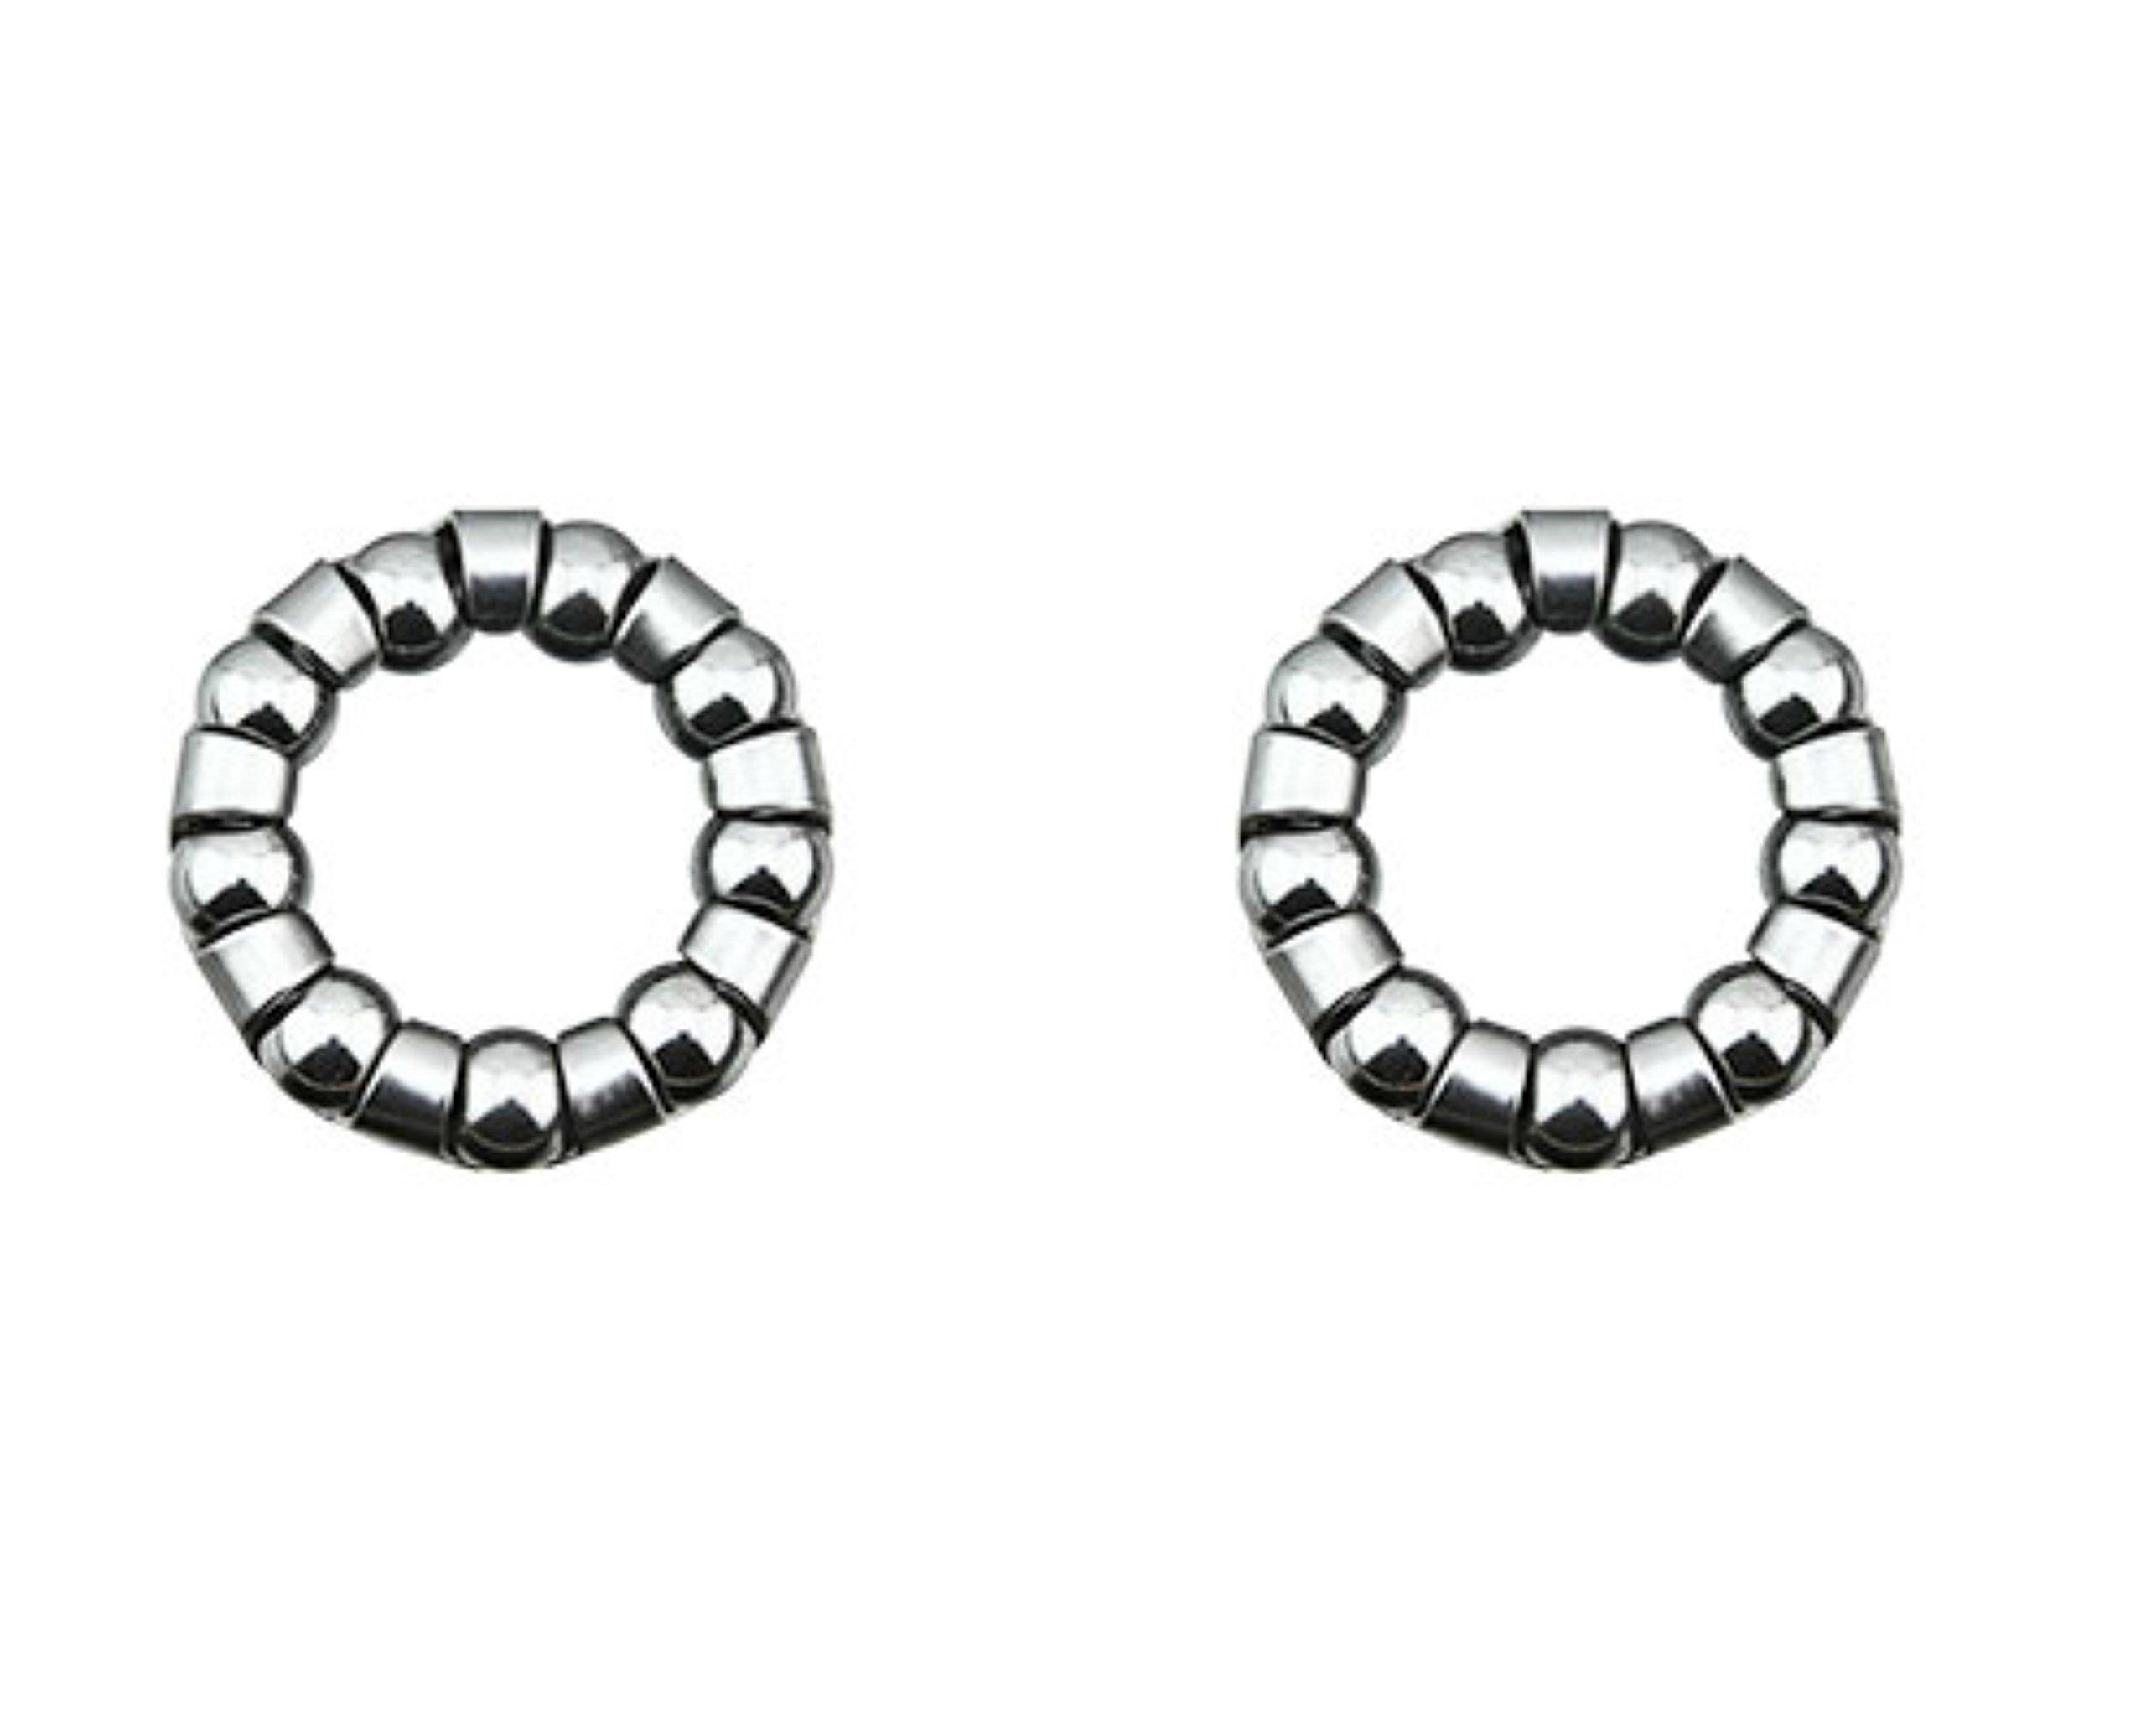 Lowrider 2-3 Piece Crank Bearings 1/4'' ball size x 9 balls. Set of bearing. Pair of bearings. for bicycle crank, bike crank, bikes, beach cruiser, limos, stretch bicycles.